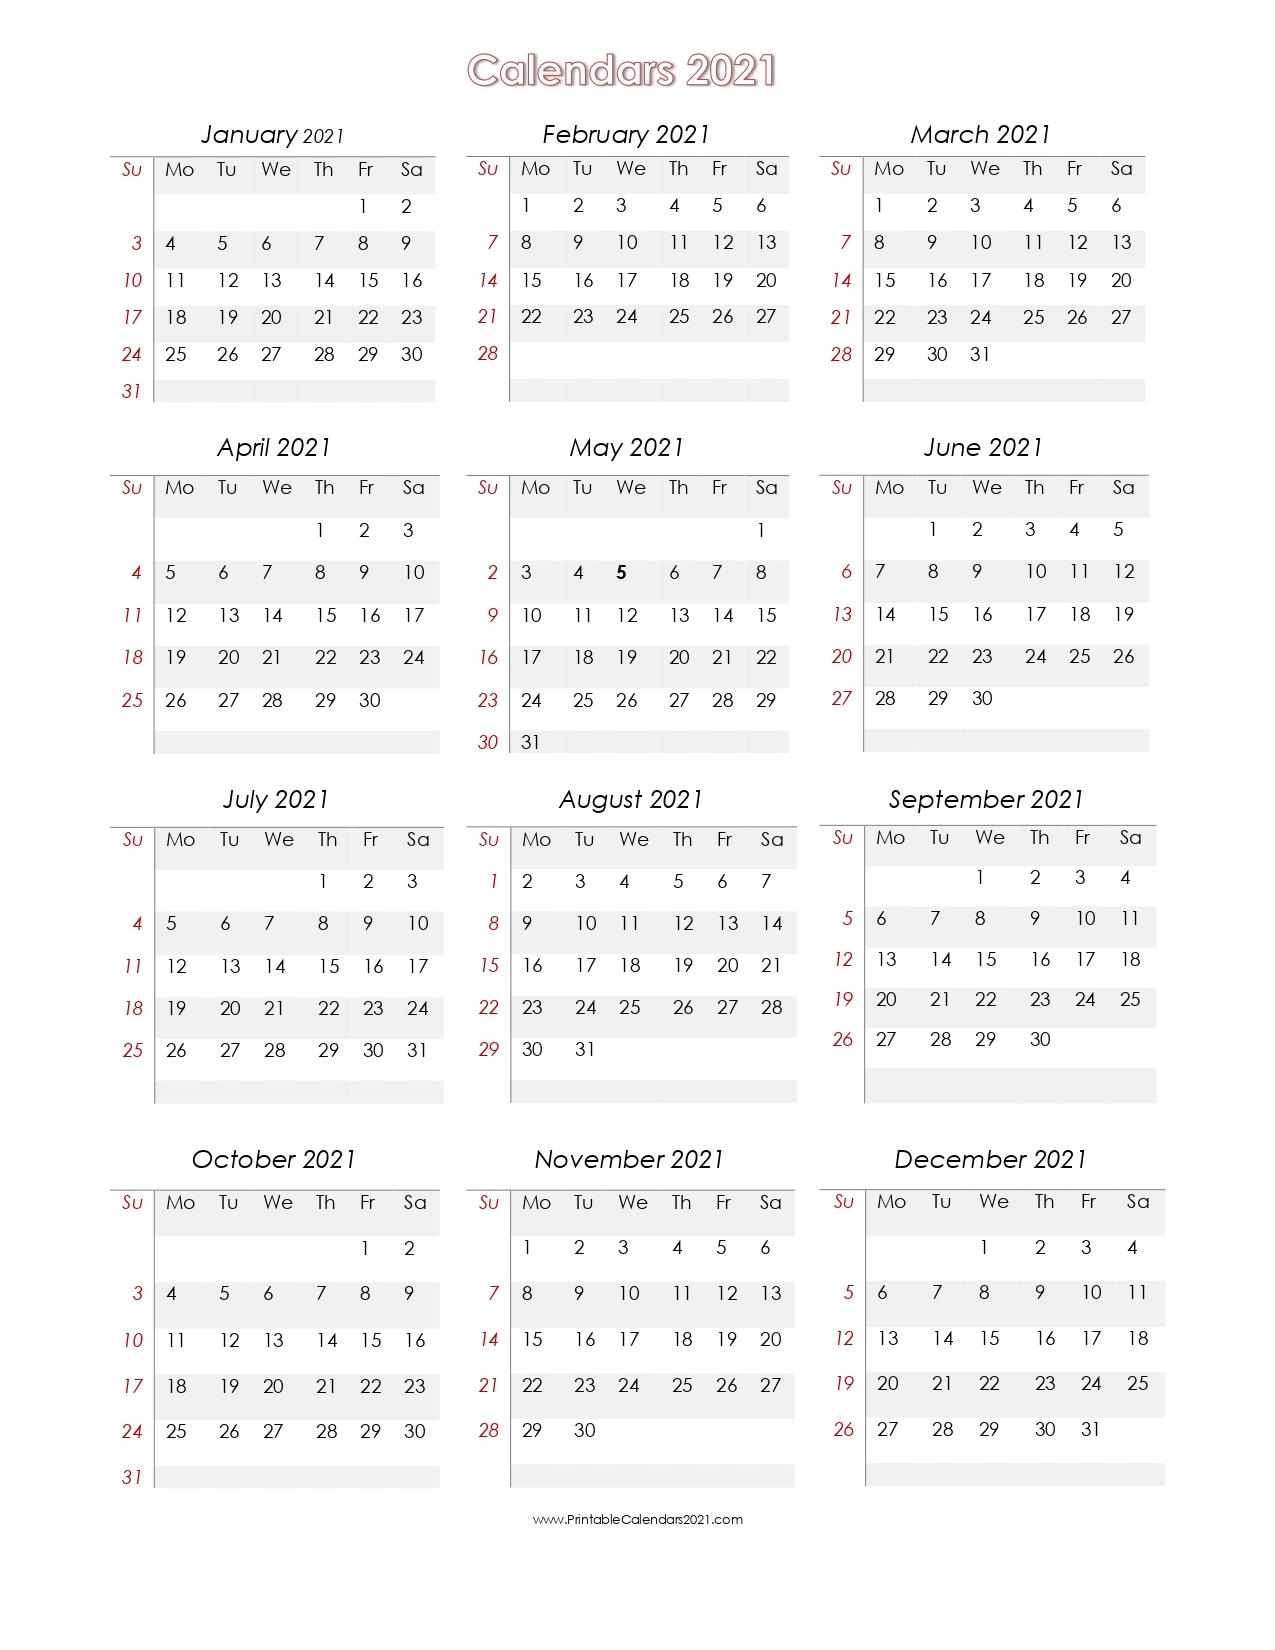 56+ Printable Calendar 2021 One Page, Us 2021 Calendar Yearly Blank regarding 2021 Calendar Free Printable